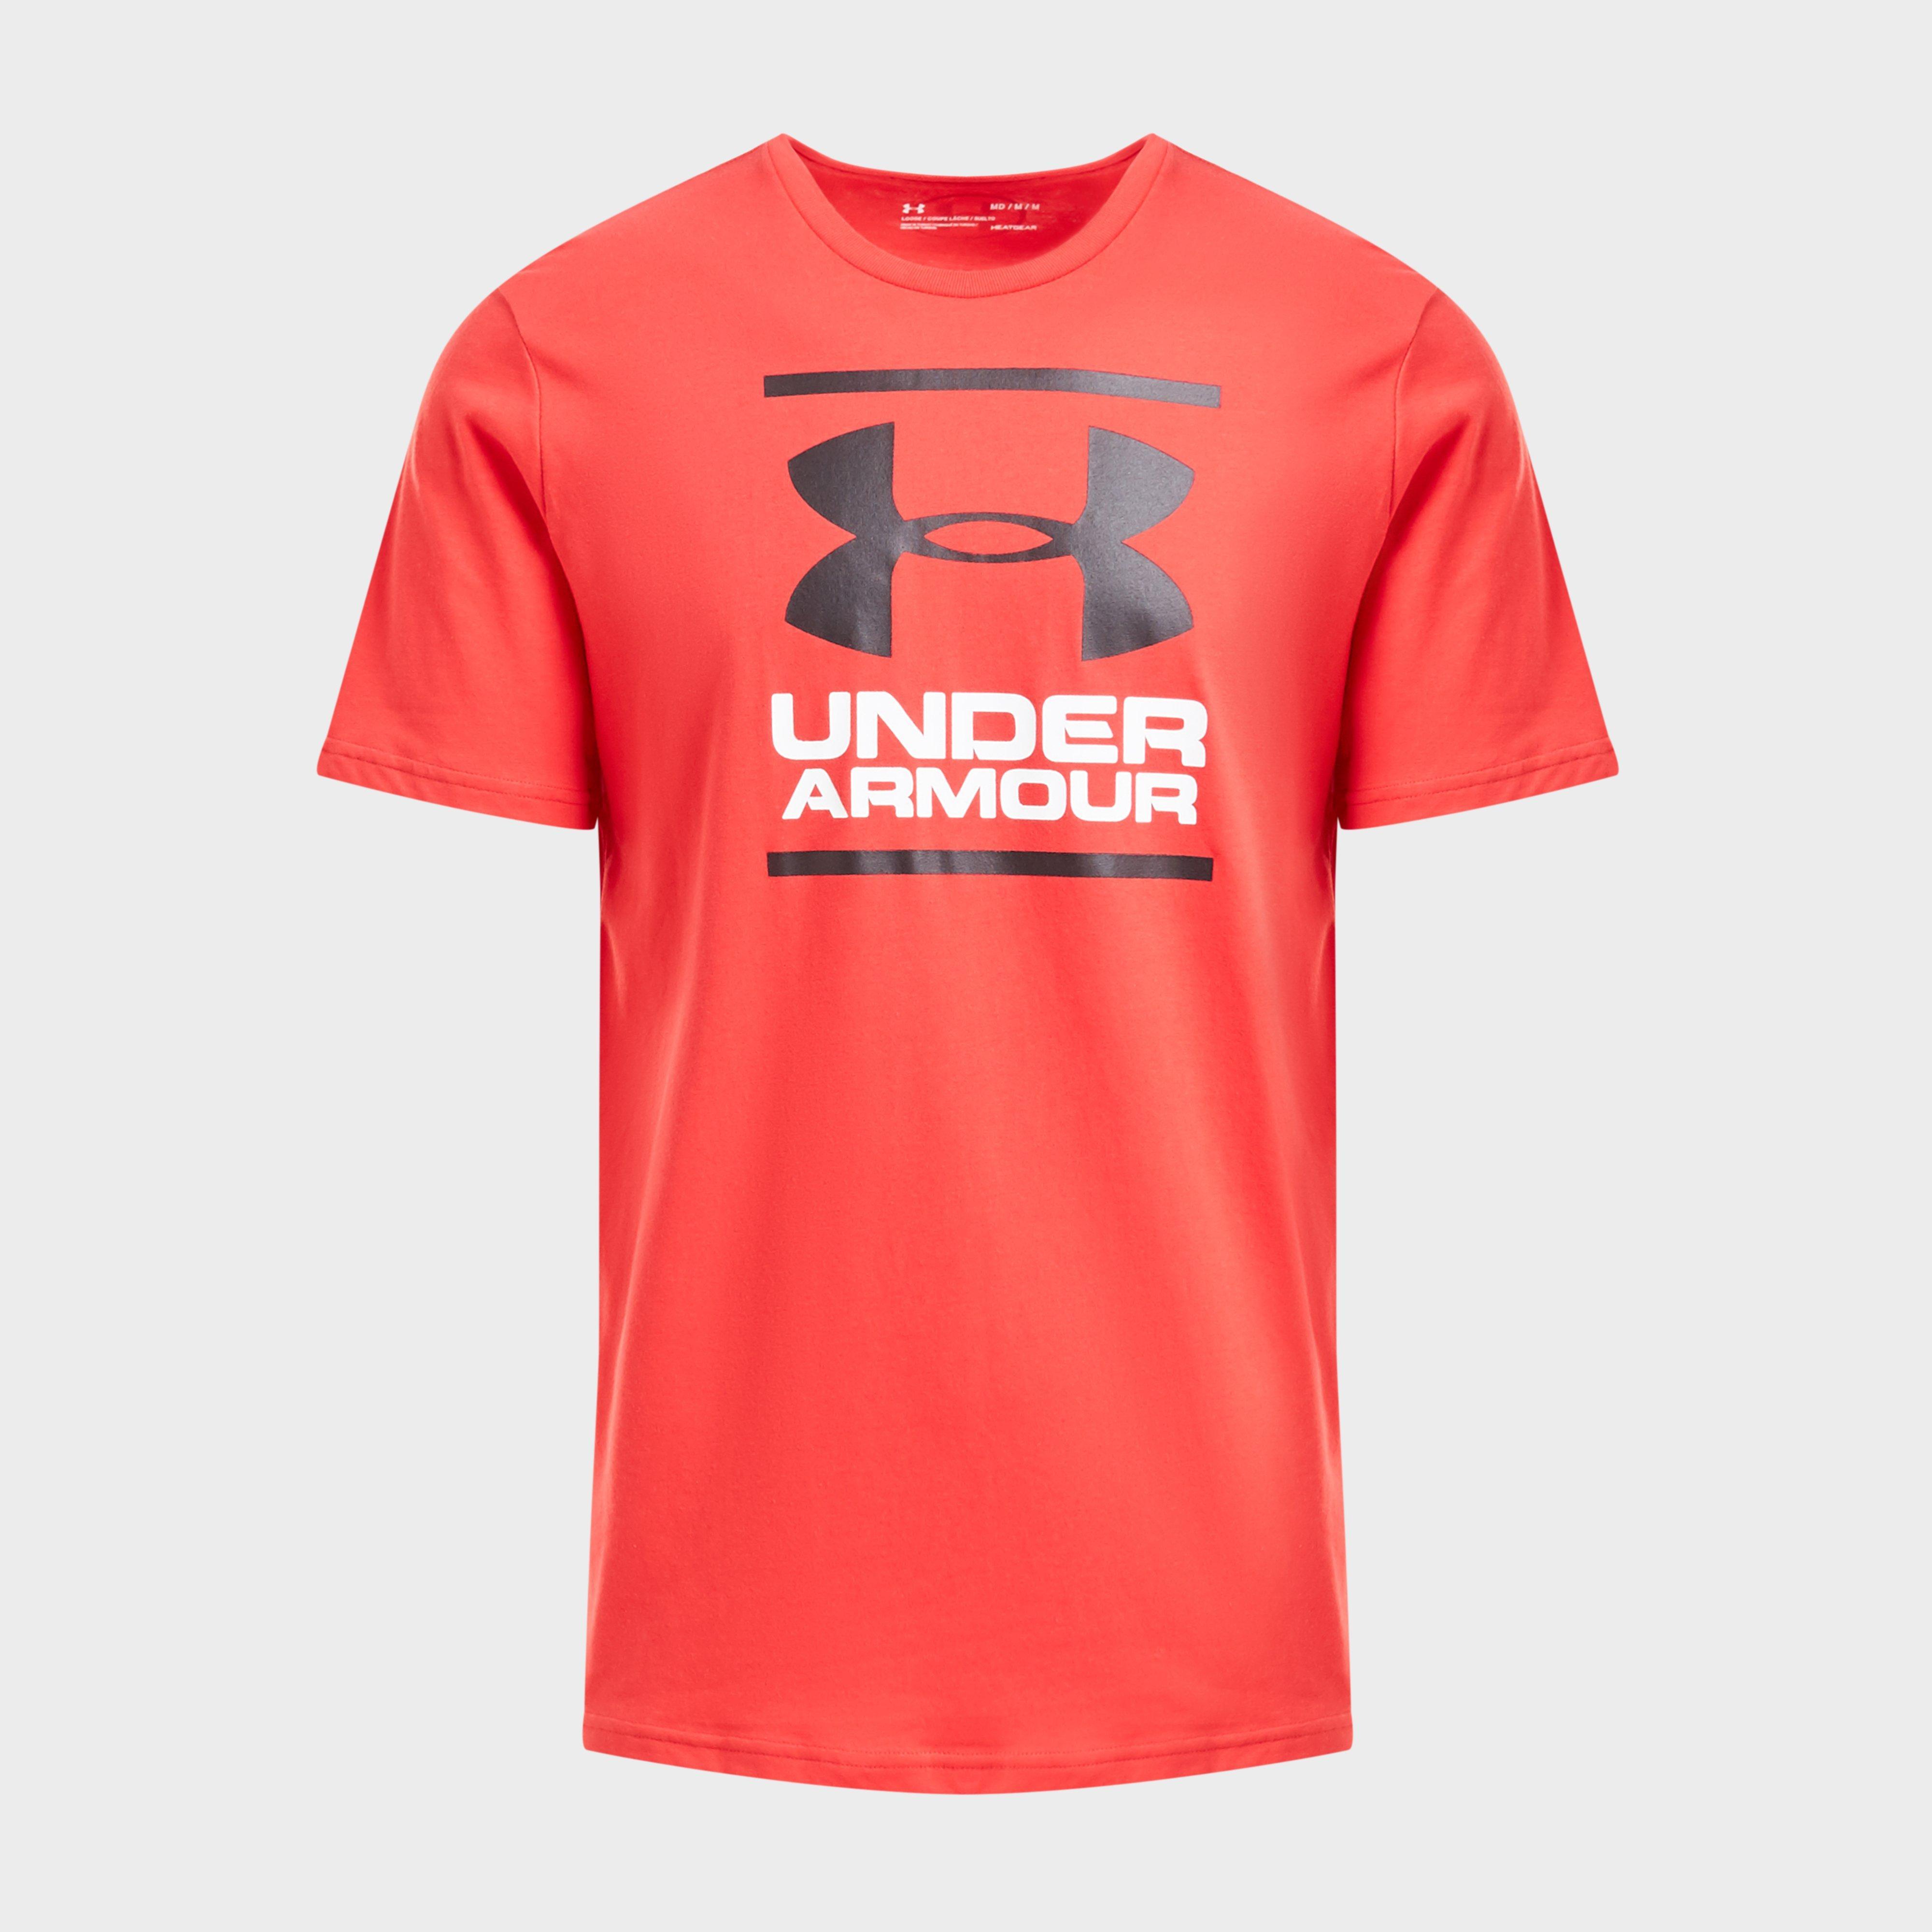 Under Armour Under Armour Mens UA GL Foundation Short Sleeve T-Shirt, Red